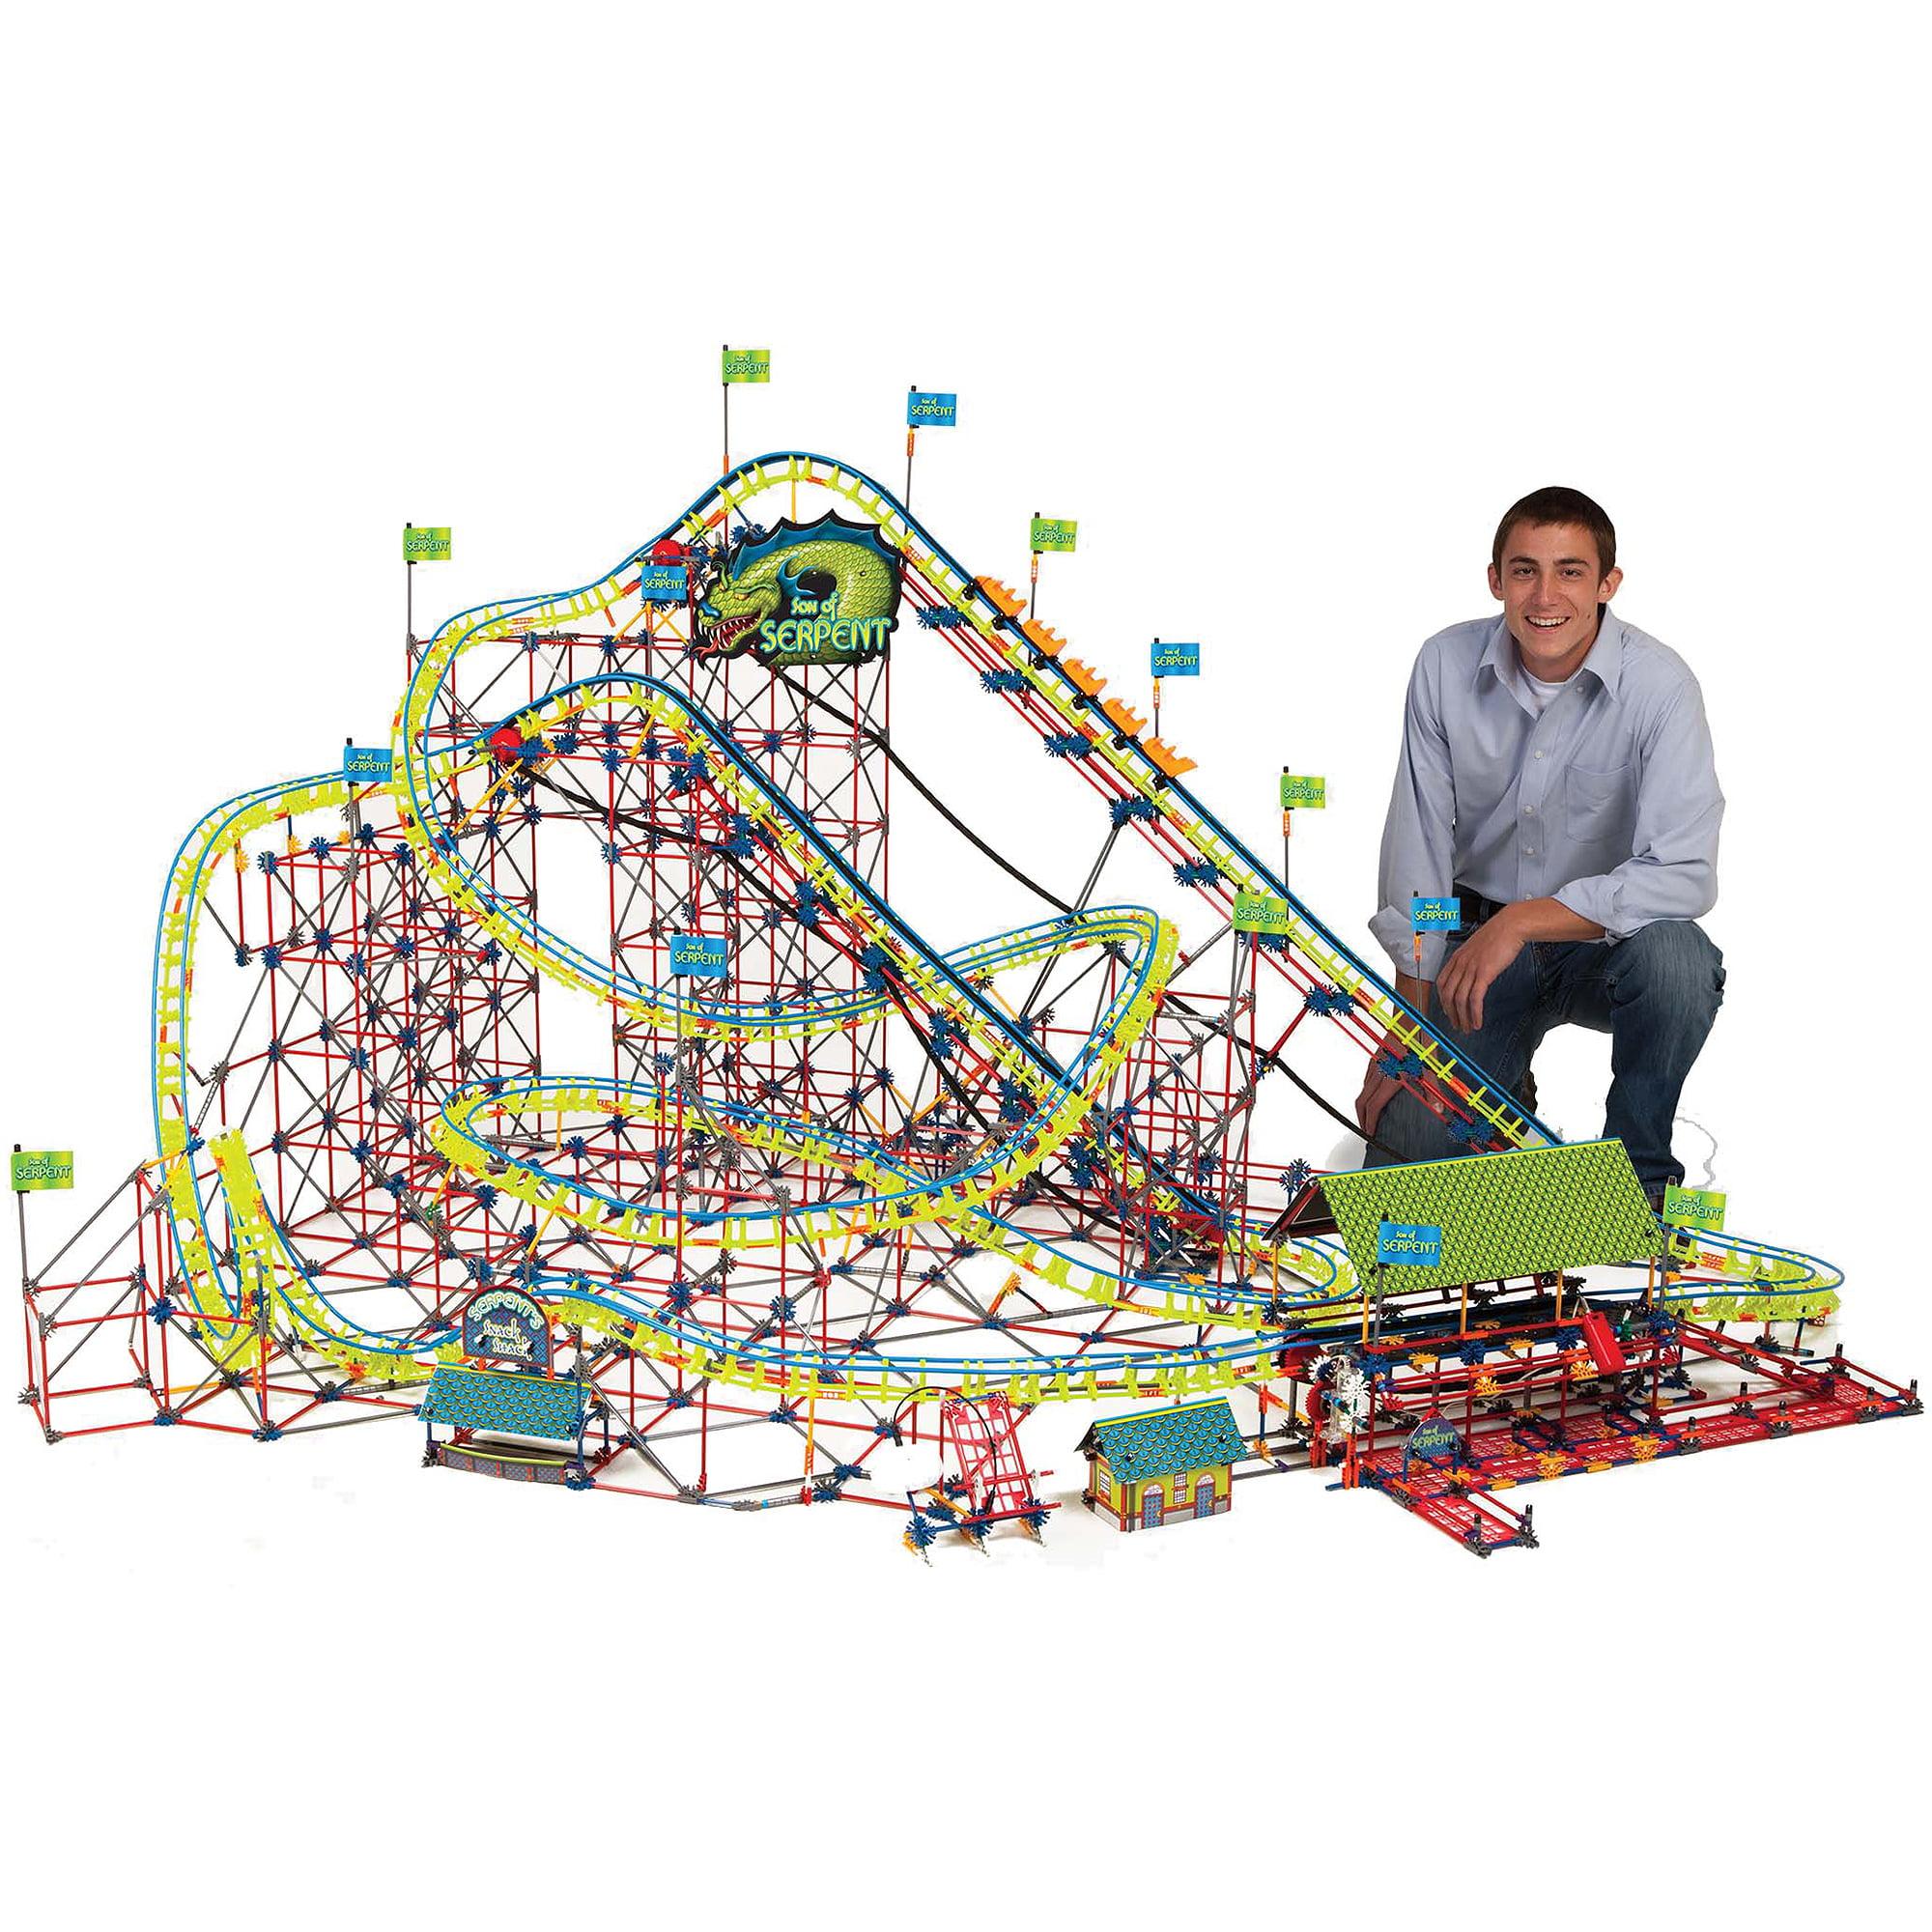 K'NEX Son of Serpent Coaster Building Set